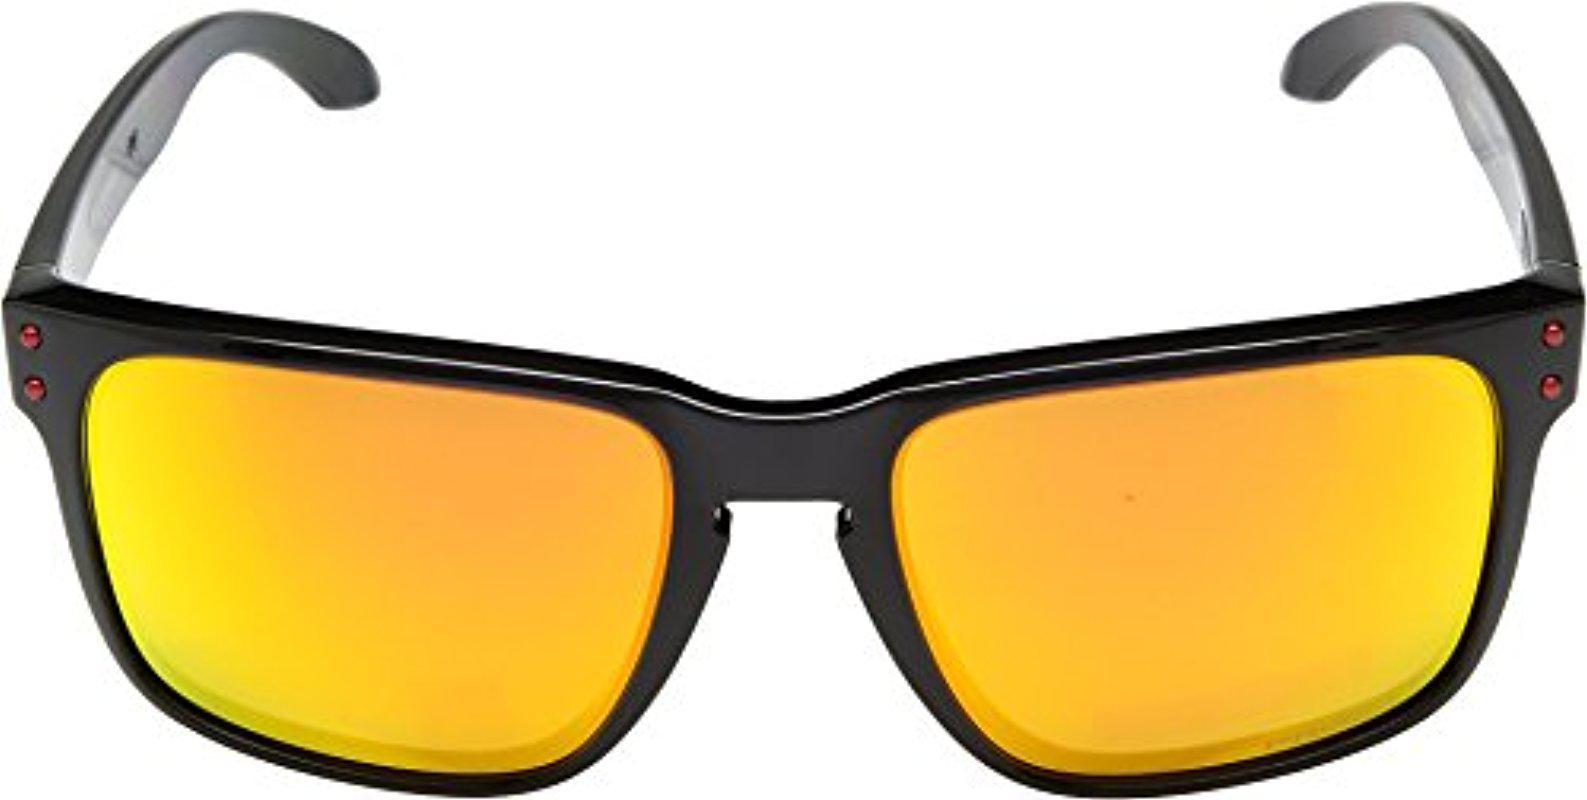 c3a9393611 Lyst - Oakley Holbrook Xl in Black for Men